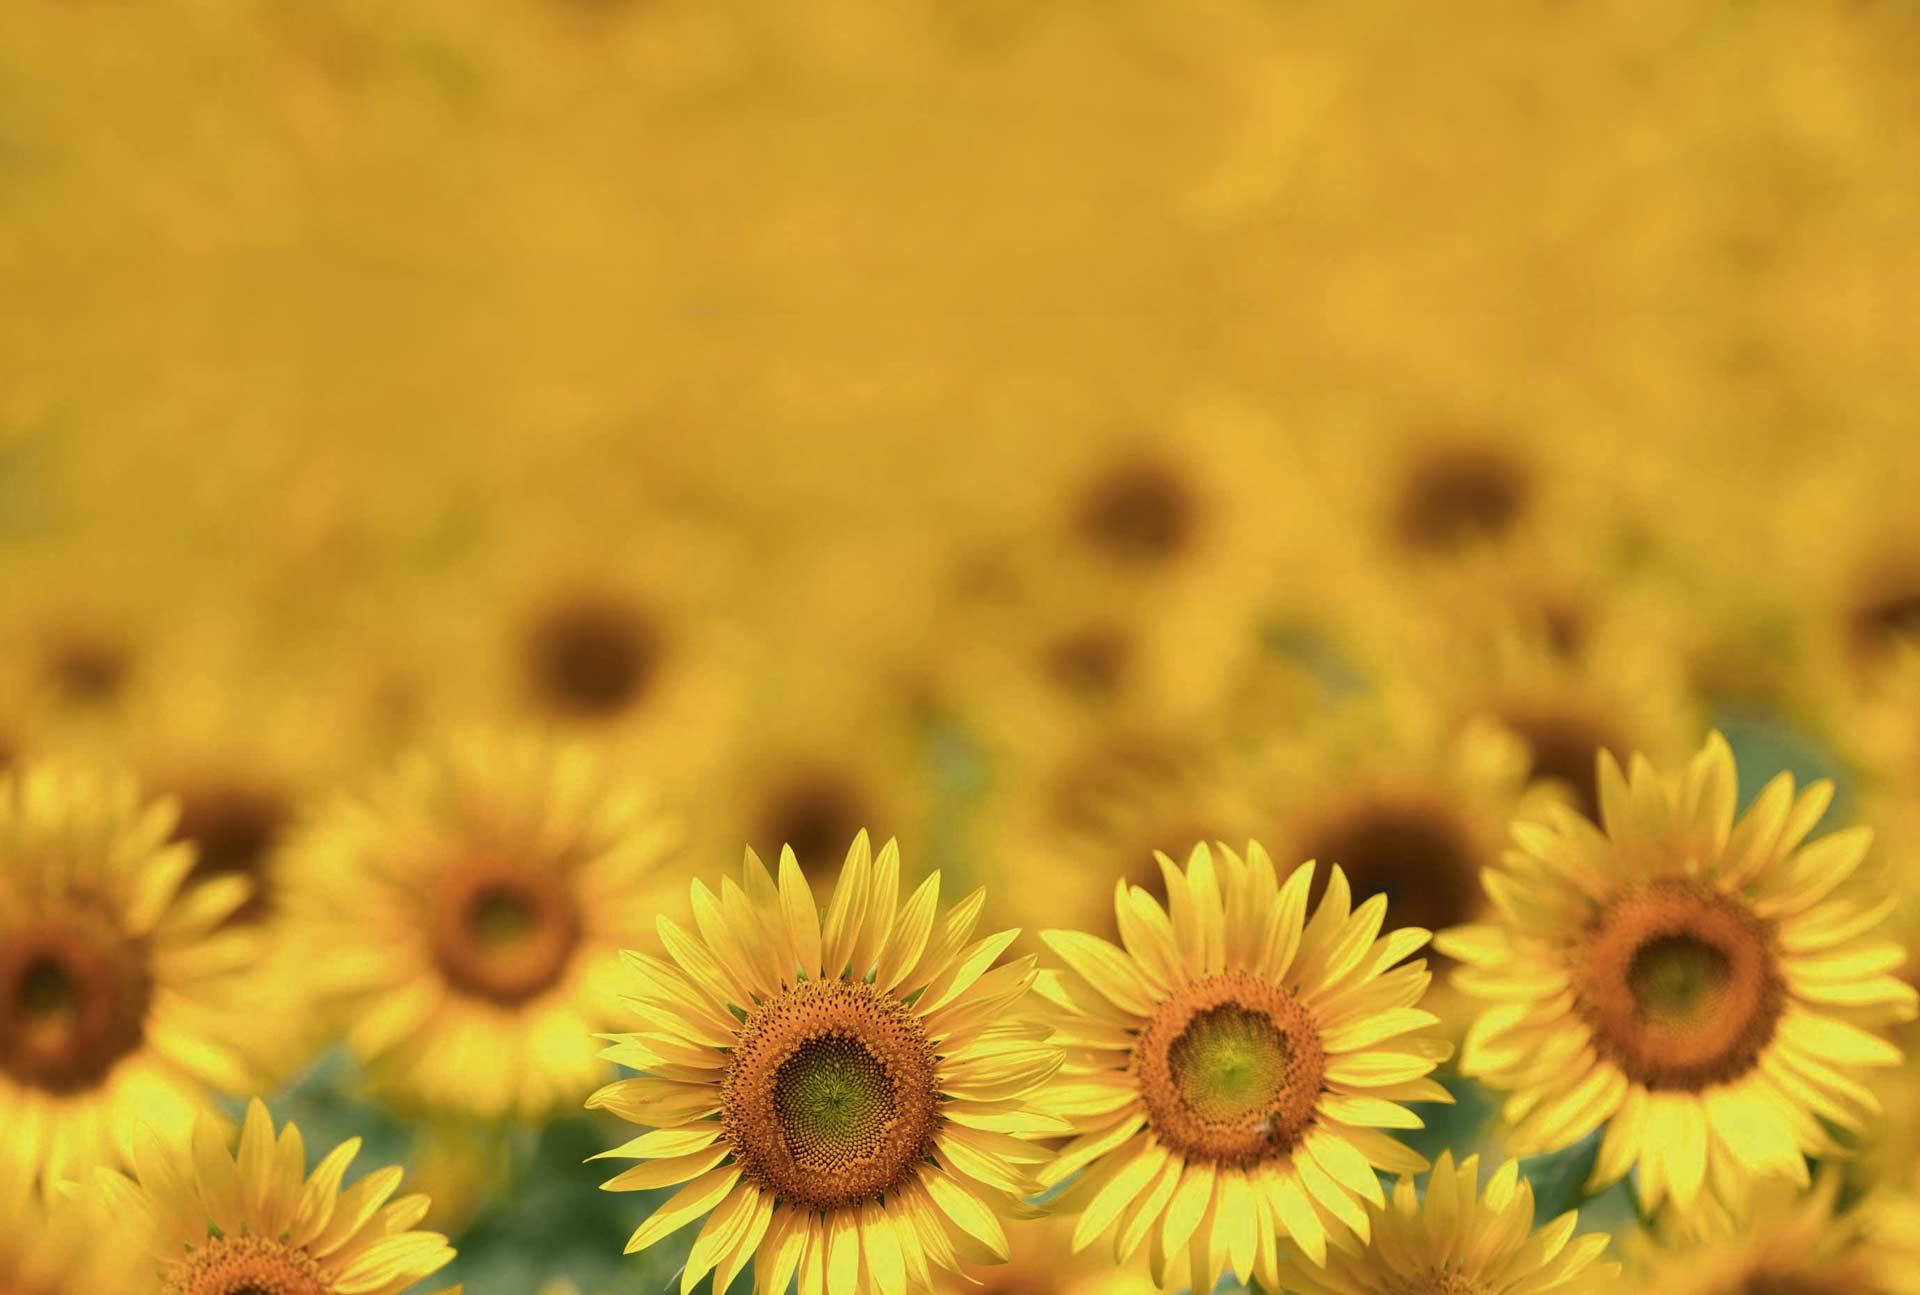 Sunflowers for Reolì spreadable sunflower oil